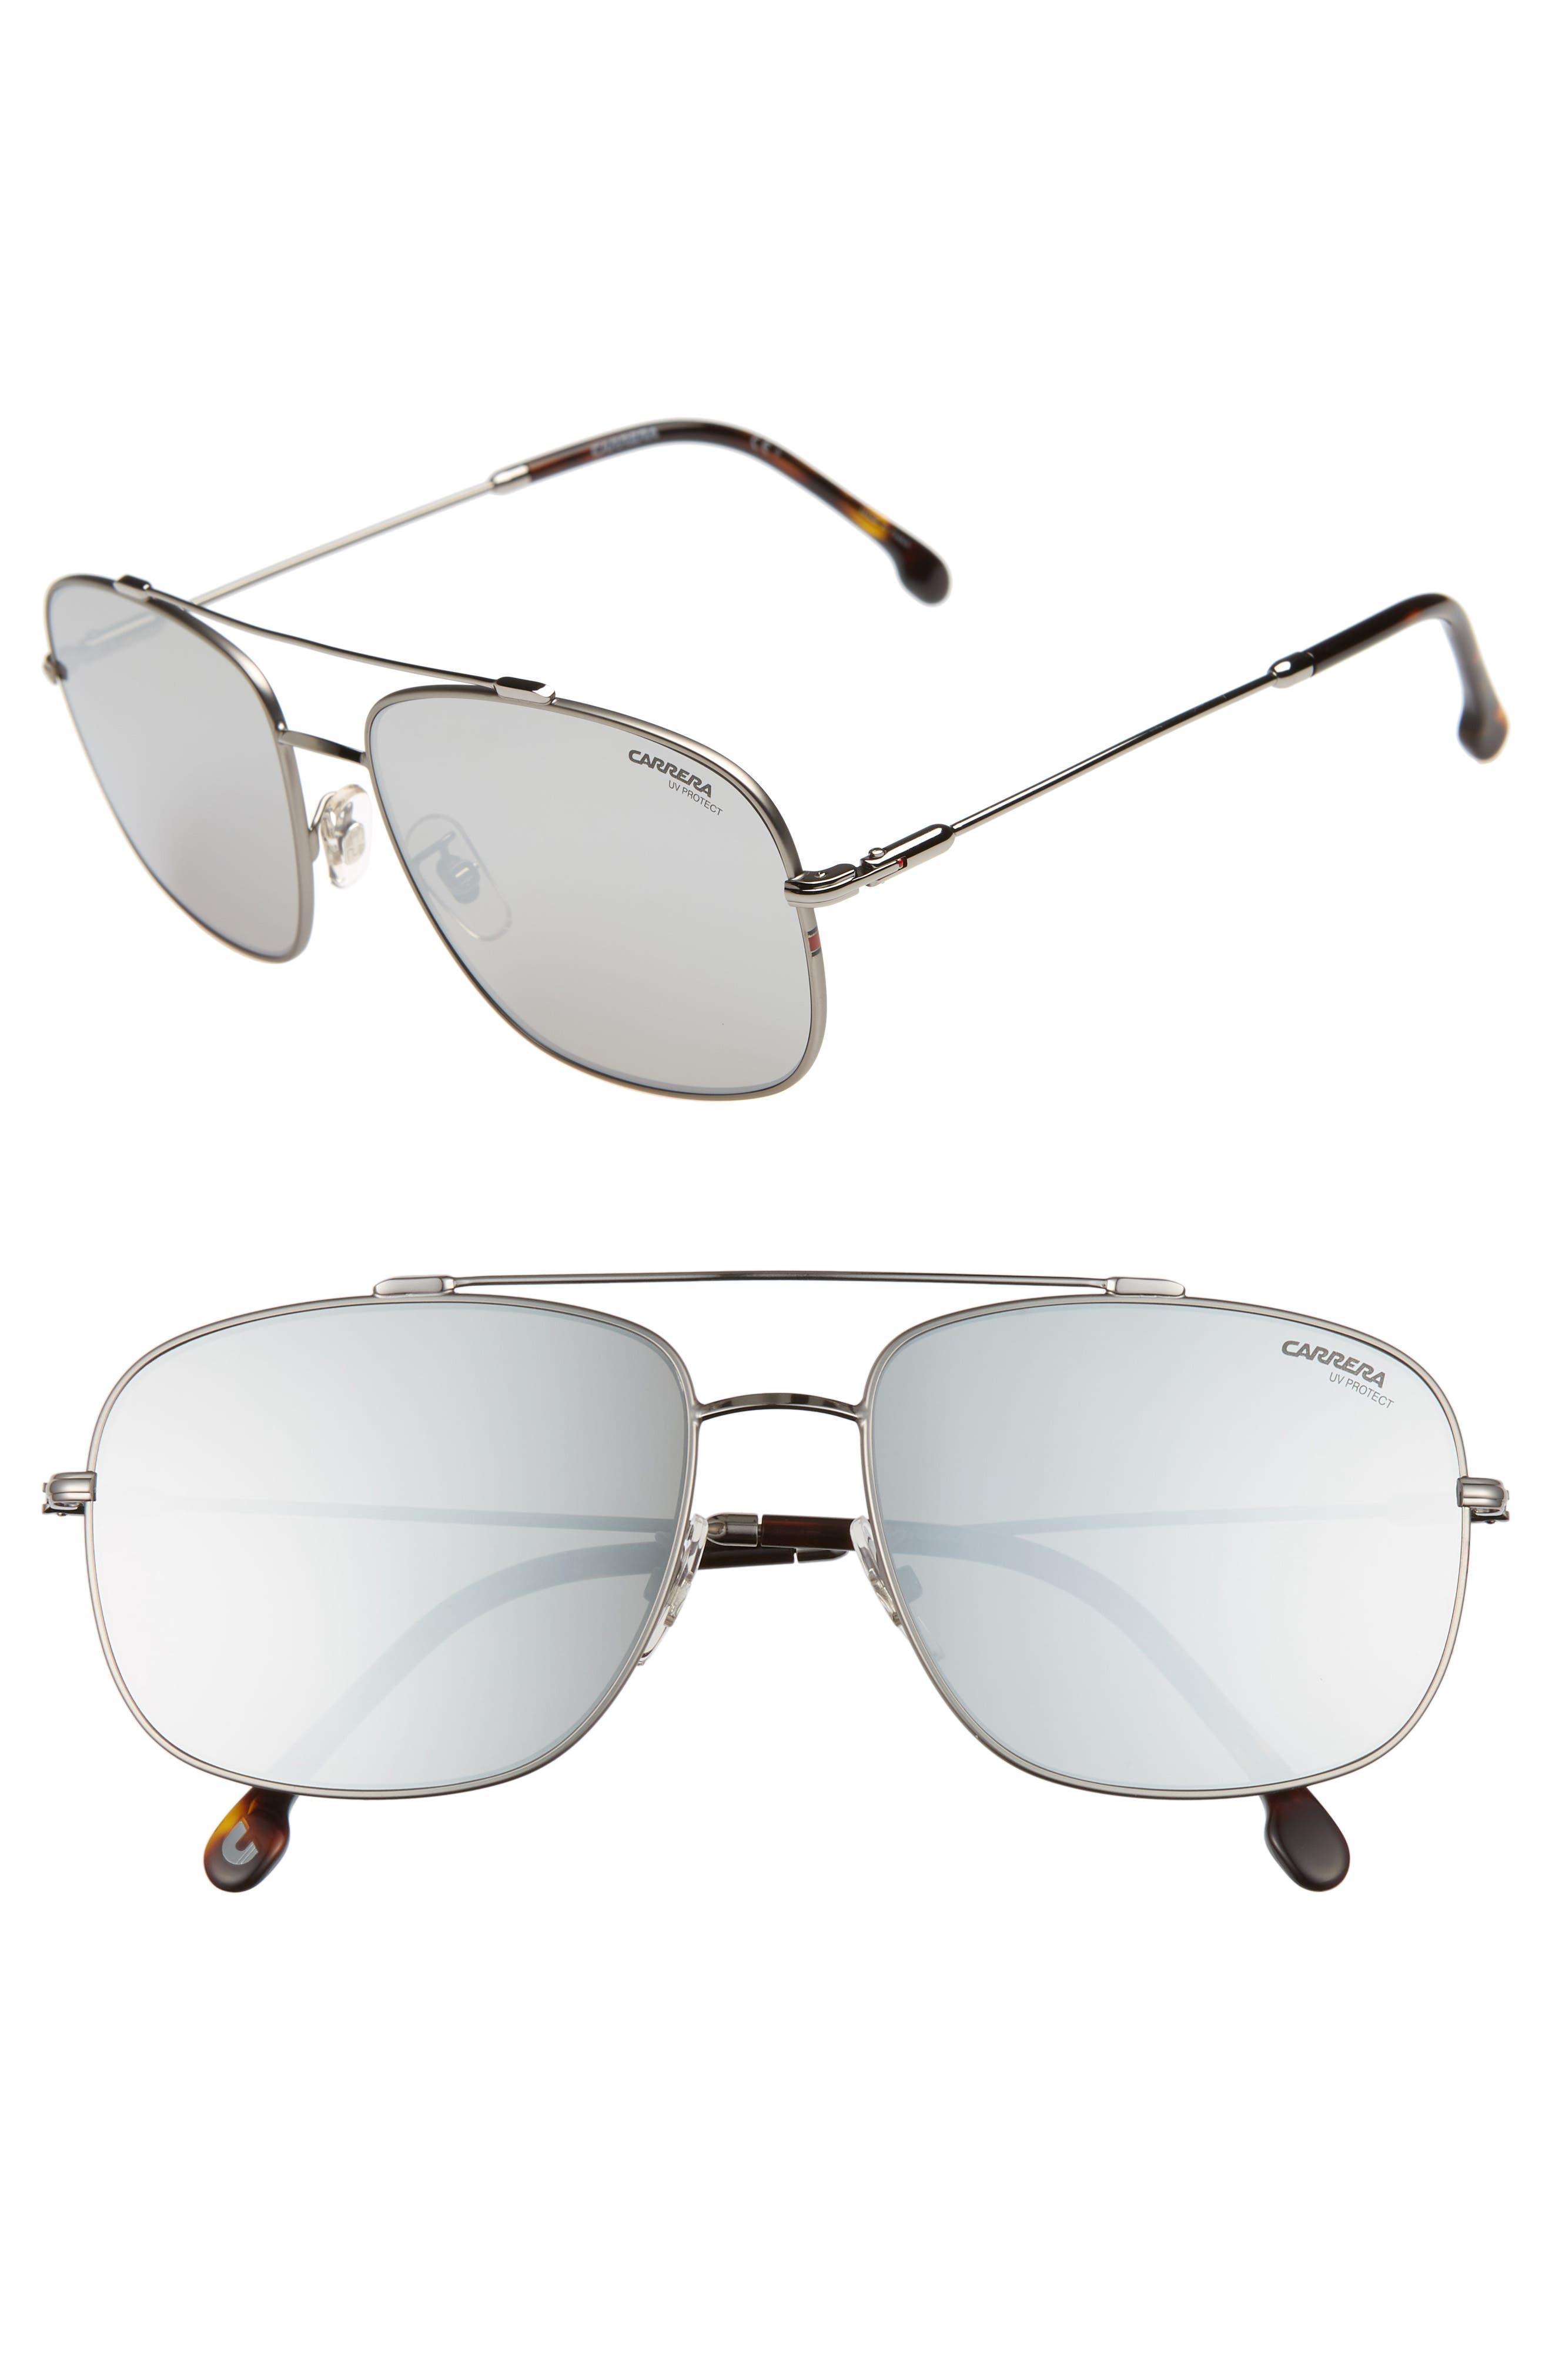 60mm Special Fit Aviator Sunglasses,                             Main thumbnail 1, color,                             RUTHENIUM